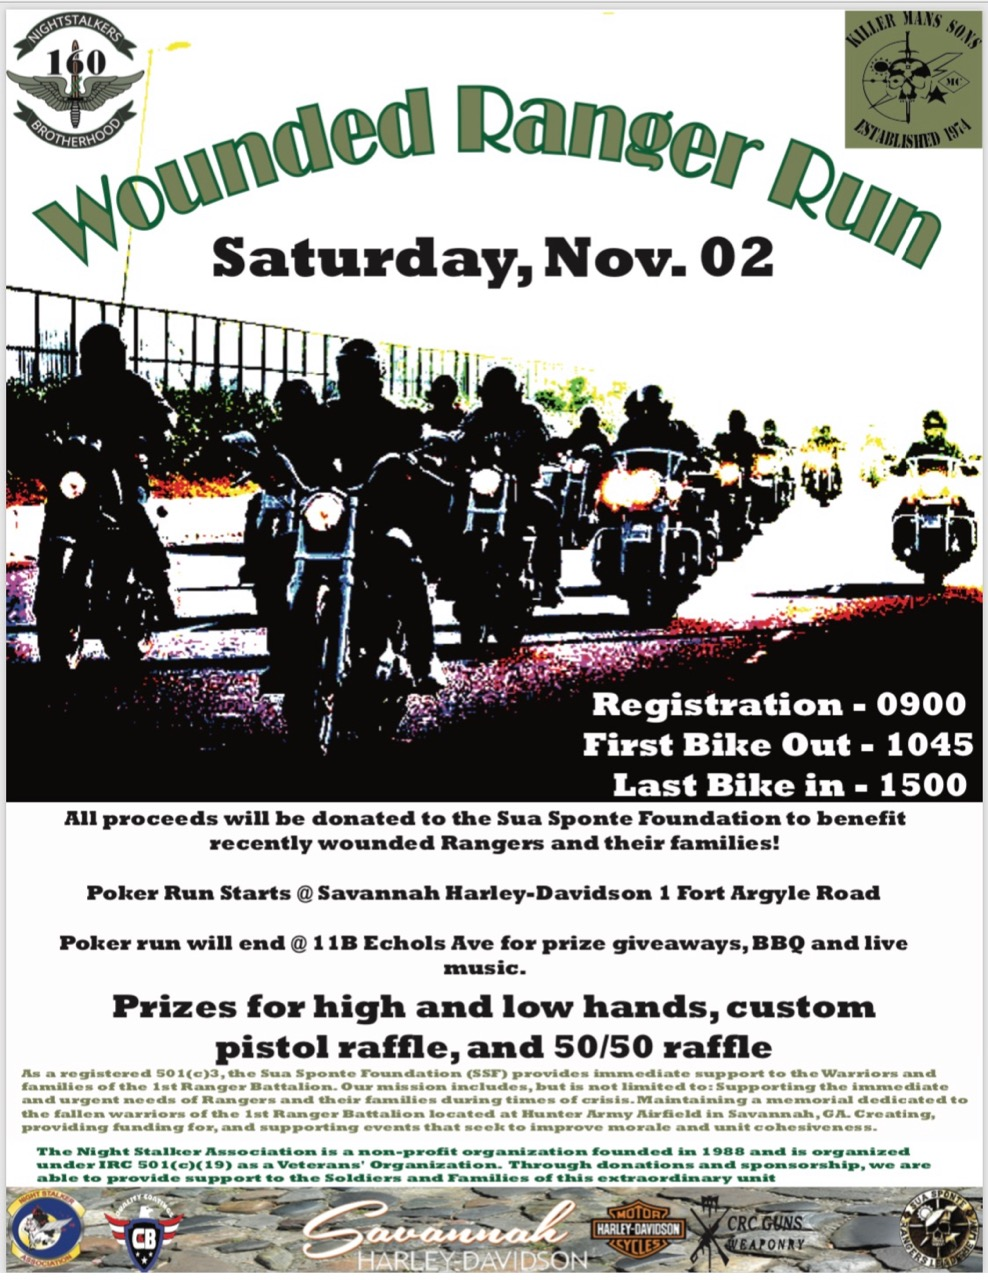 Killer Mans Sons MC/Nightstalkers Brotherhood - Wounded Ranger Run @ Savannah Harley-Davidson | Savannah | Georgia | United States